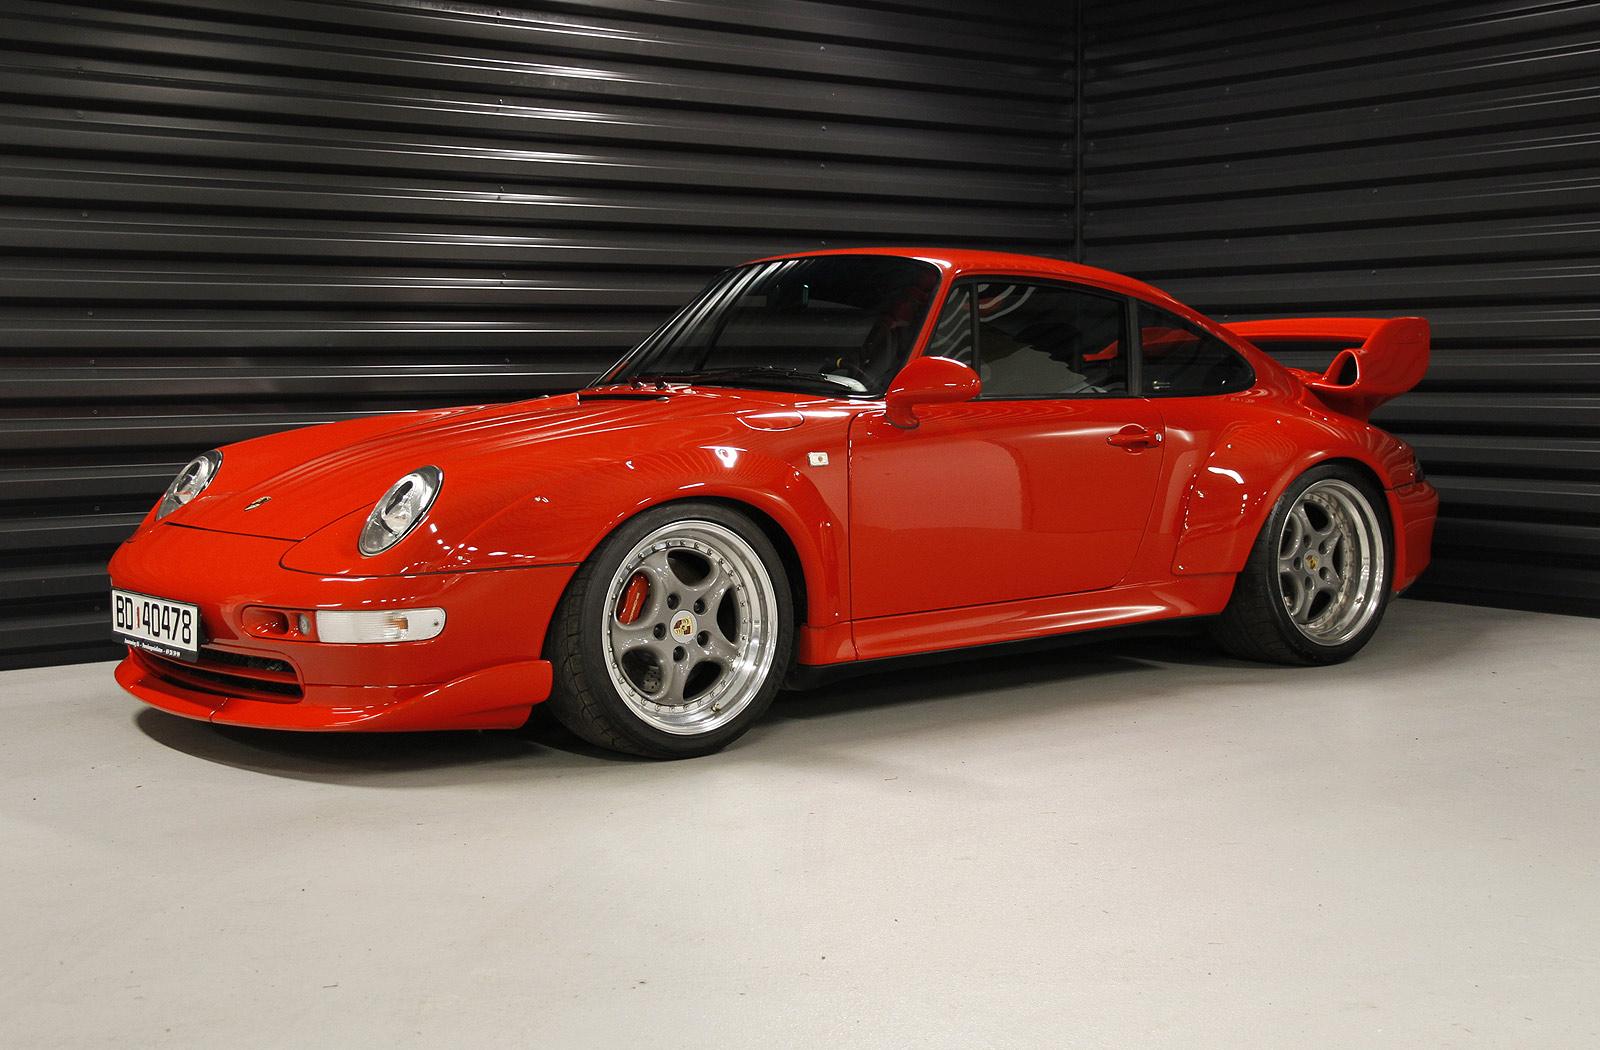 993 Porsche Turbo